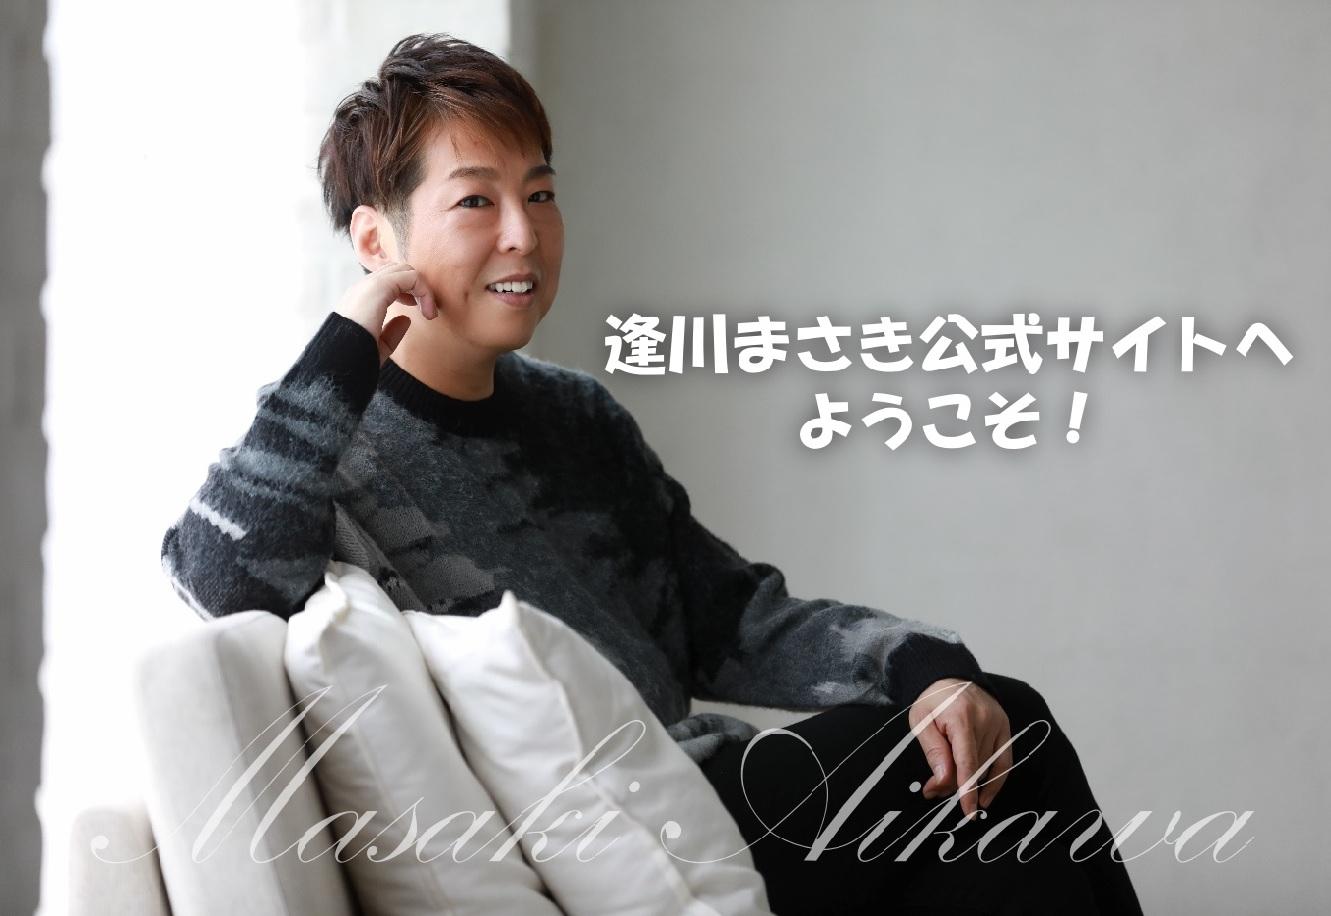 ホーム - aikawa-masaki ページ!